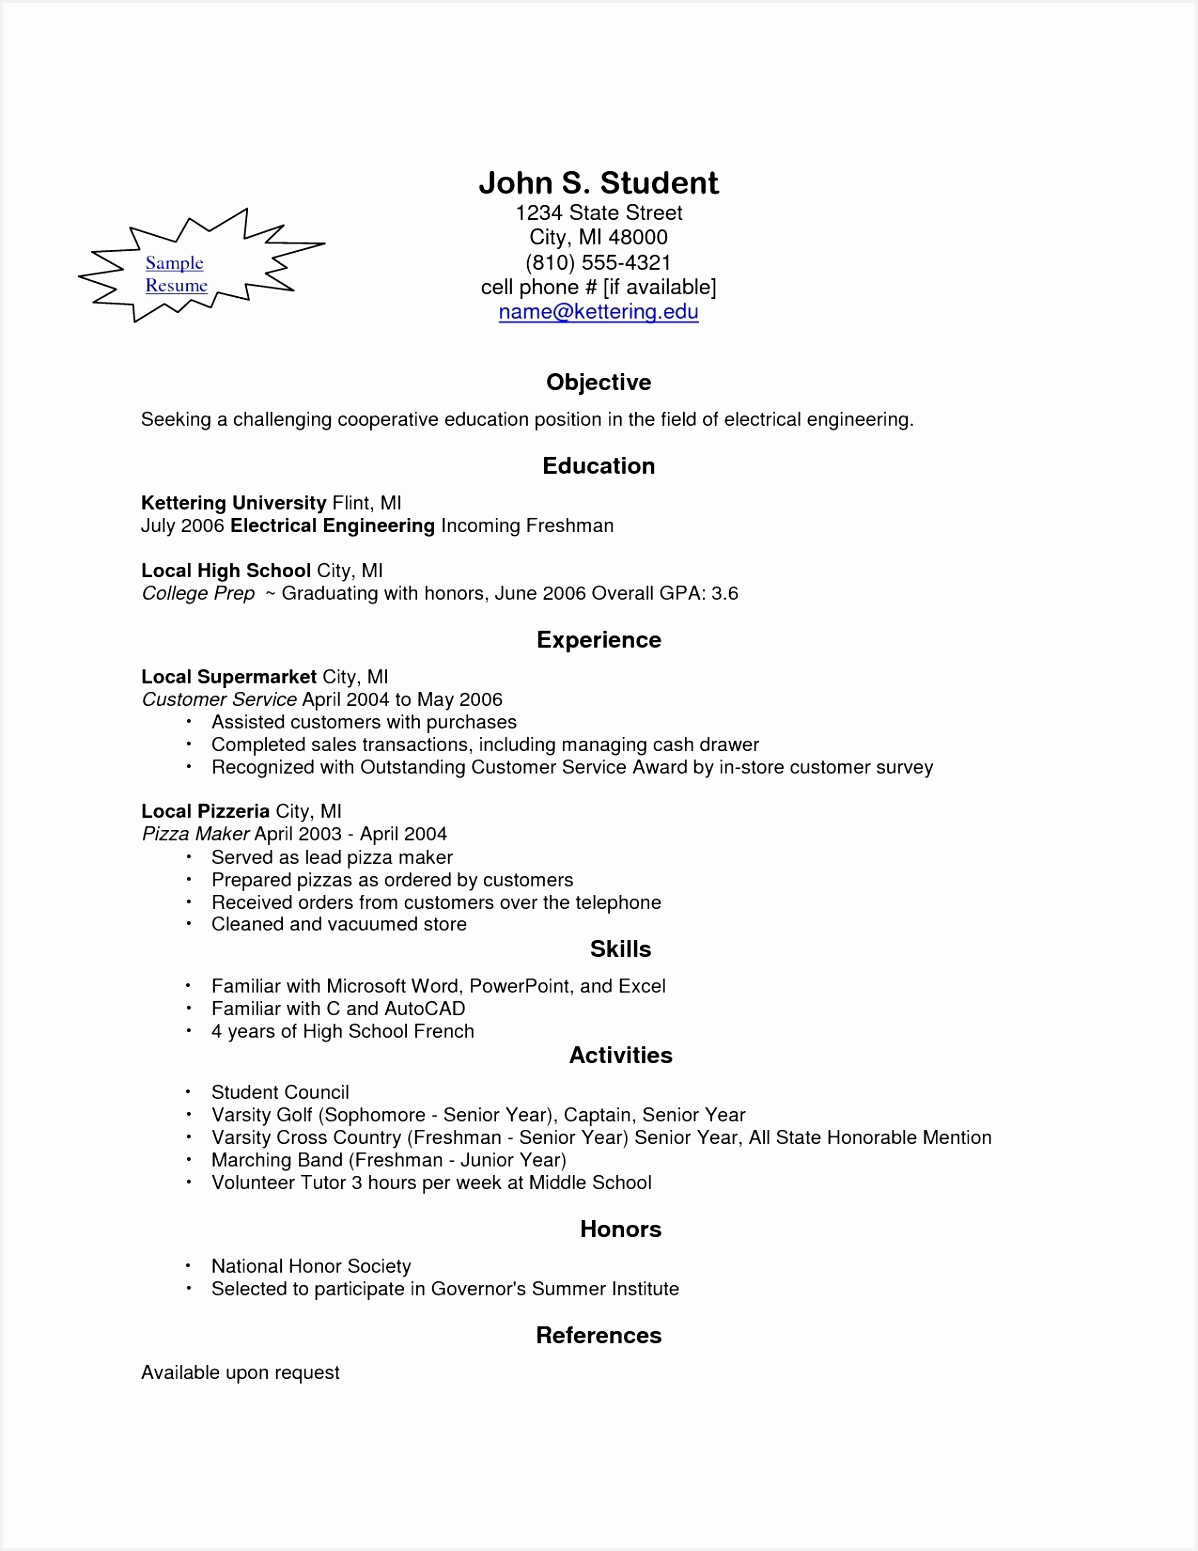 Electrical Field Engineer Sample Resume Vdflf Fresh Free Resume Maker Beautiful Awesome Best Resume Maker Awesome Resume Of 6 Electrical Field Engineer Sample Resume